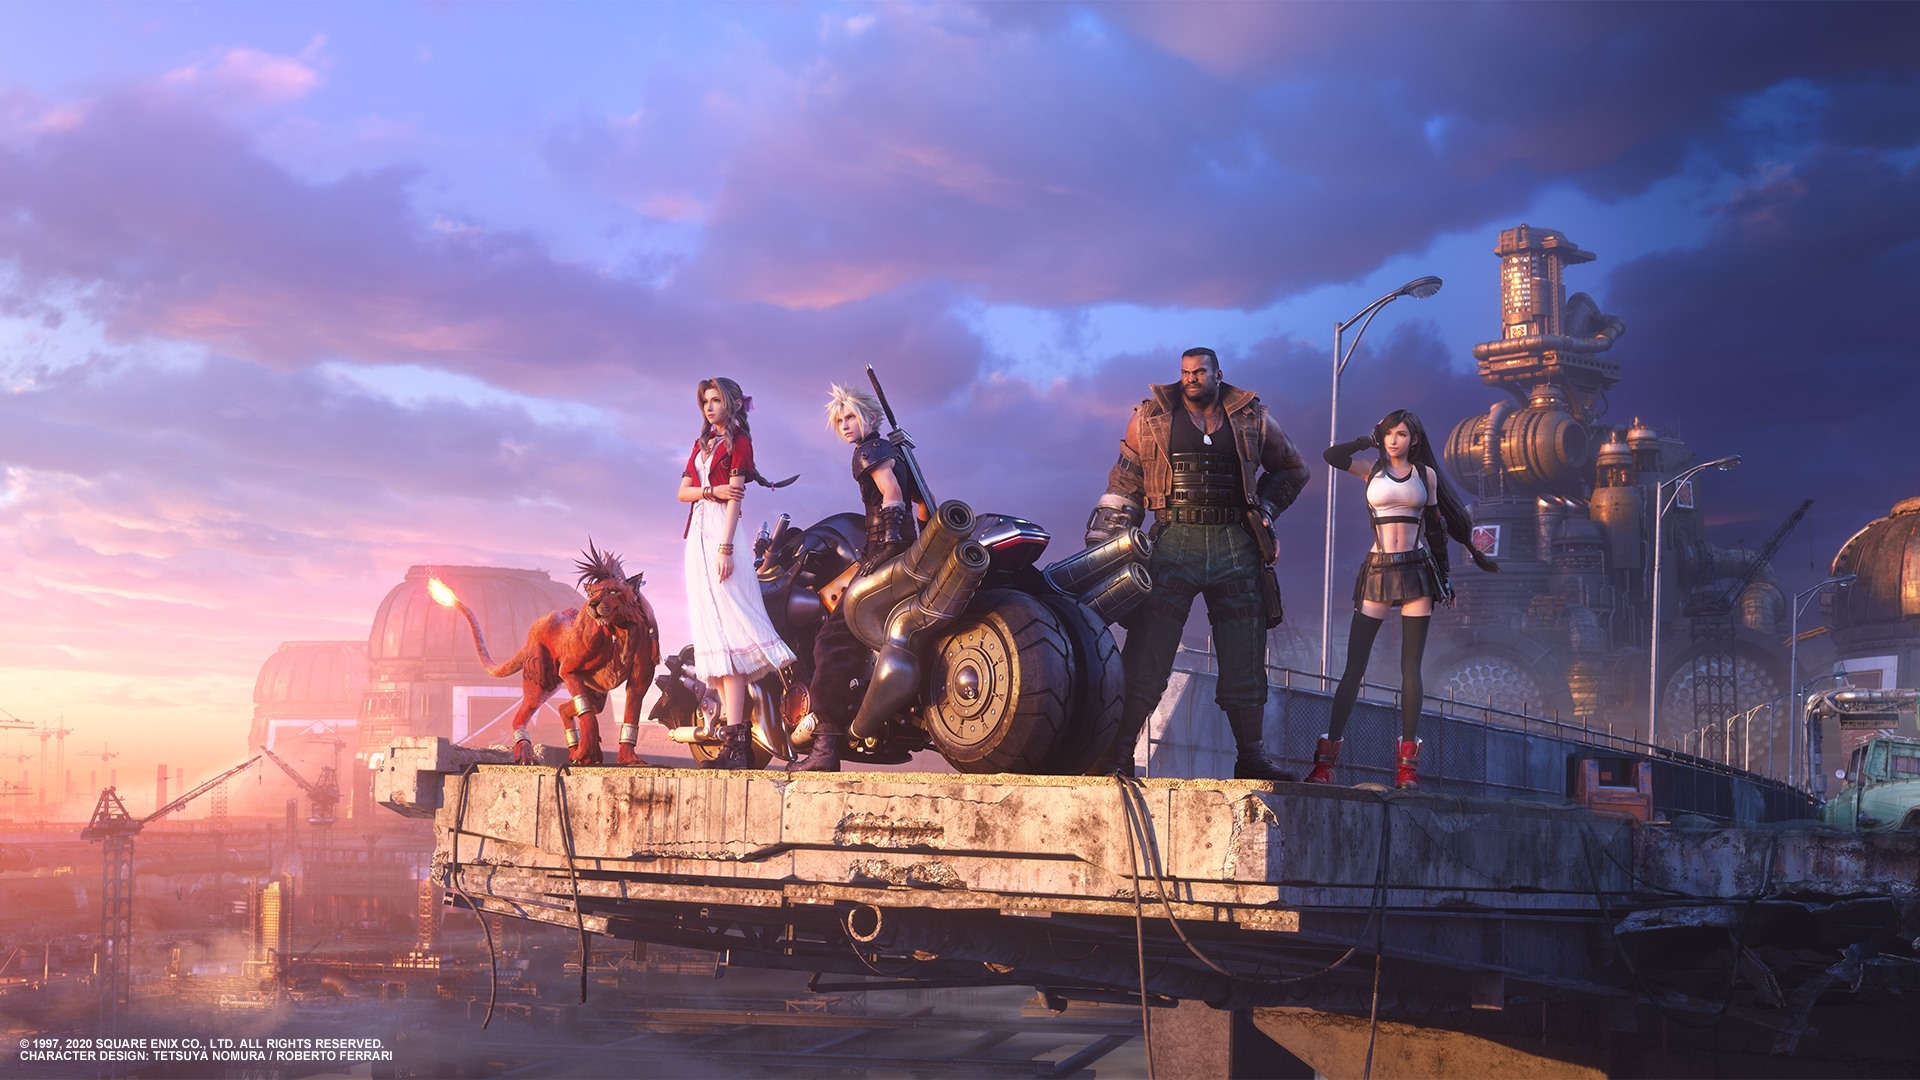 Final Fantasy 7 Remake Team Wallpaper, HD Games 4K ...